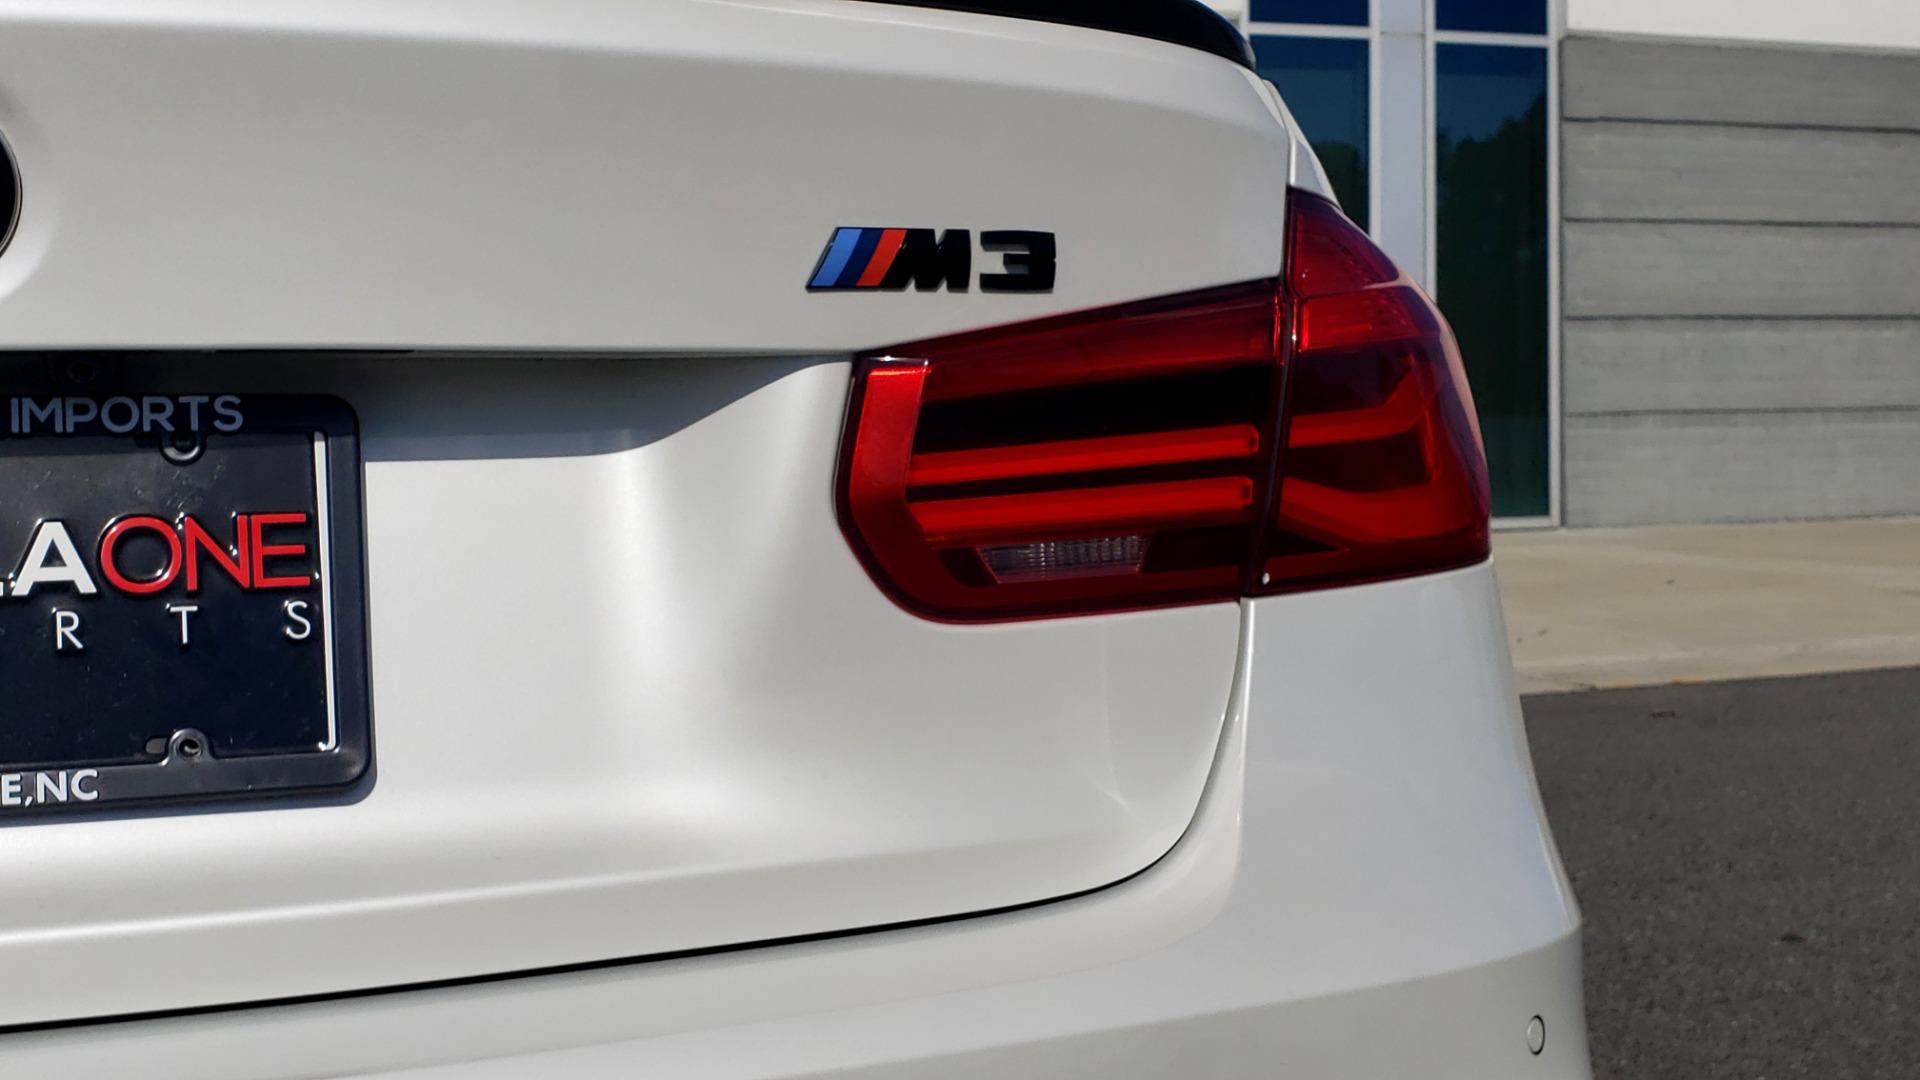 Used 2016 BMW M3 SEDAN / EXECUTIVE PKG / M-SUSPENSION / HARMAN/KARDON SOUND for sale Sold at Formula Imports in Charlotte NC 28227 33